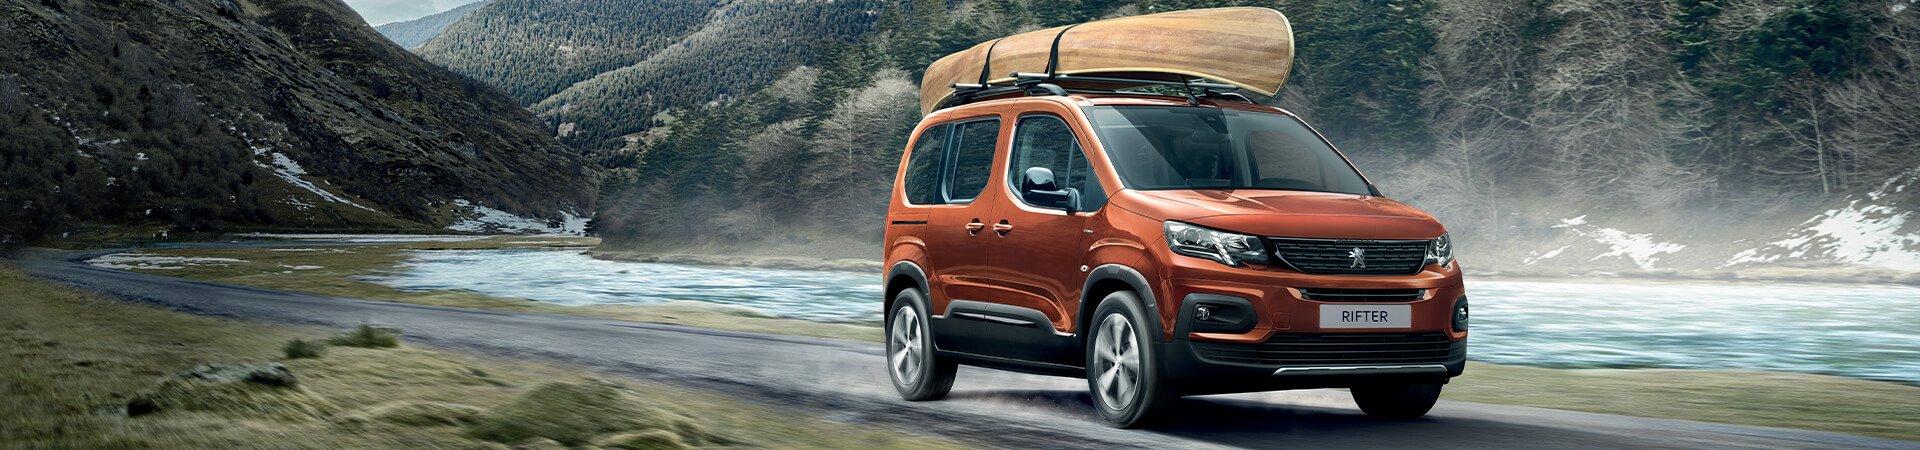 Peugeot Rifter se 7letou zárukou